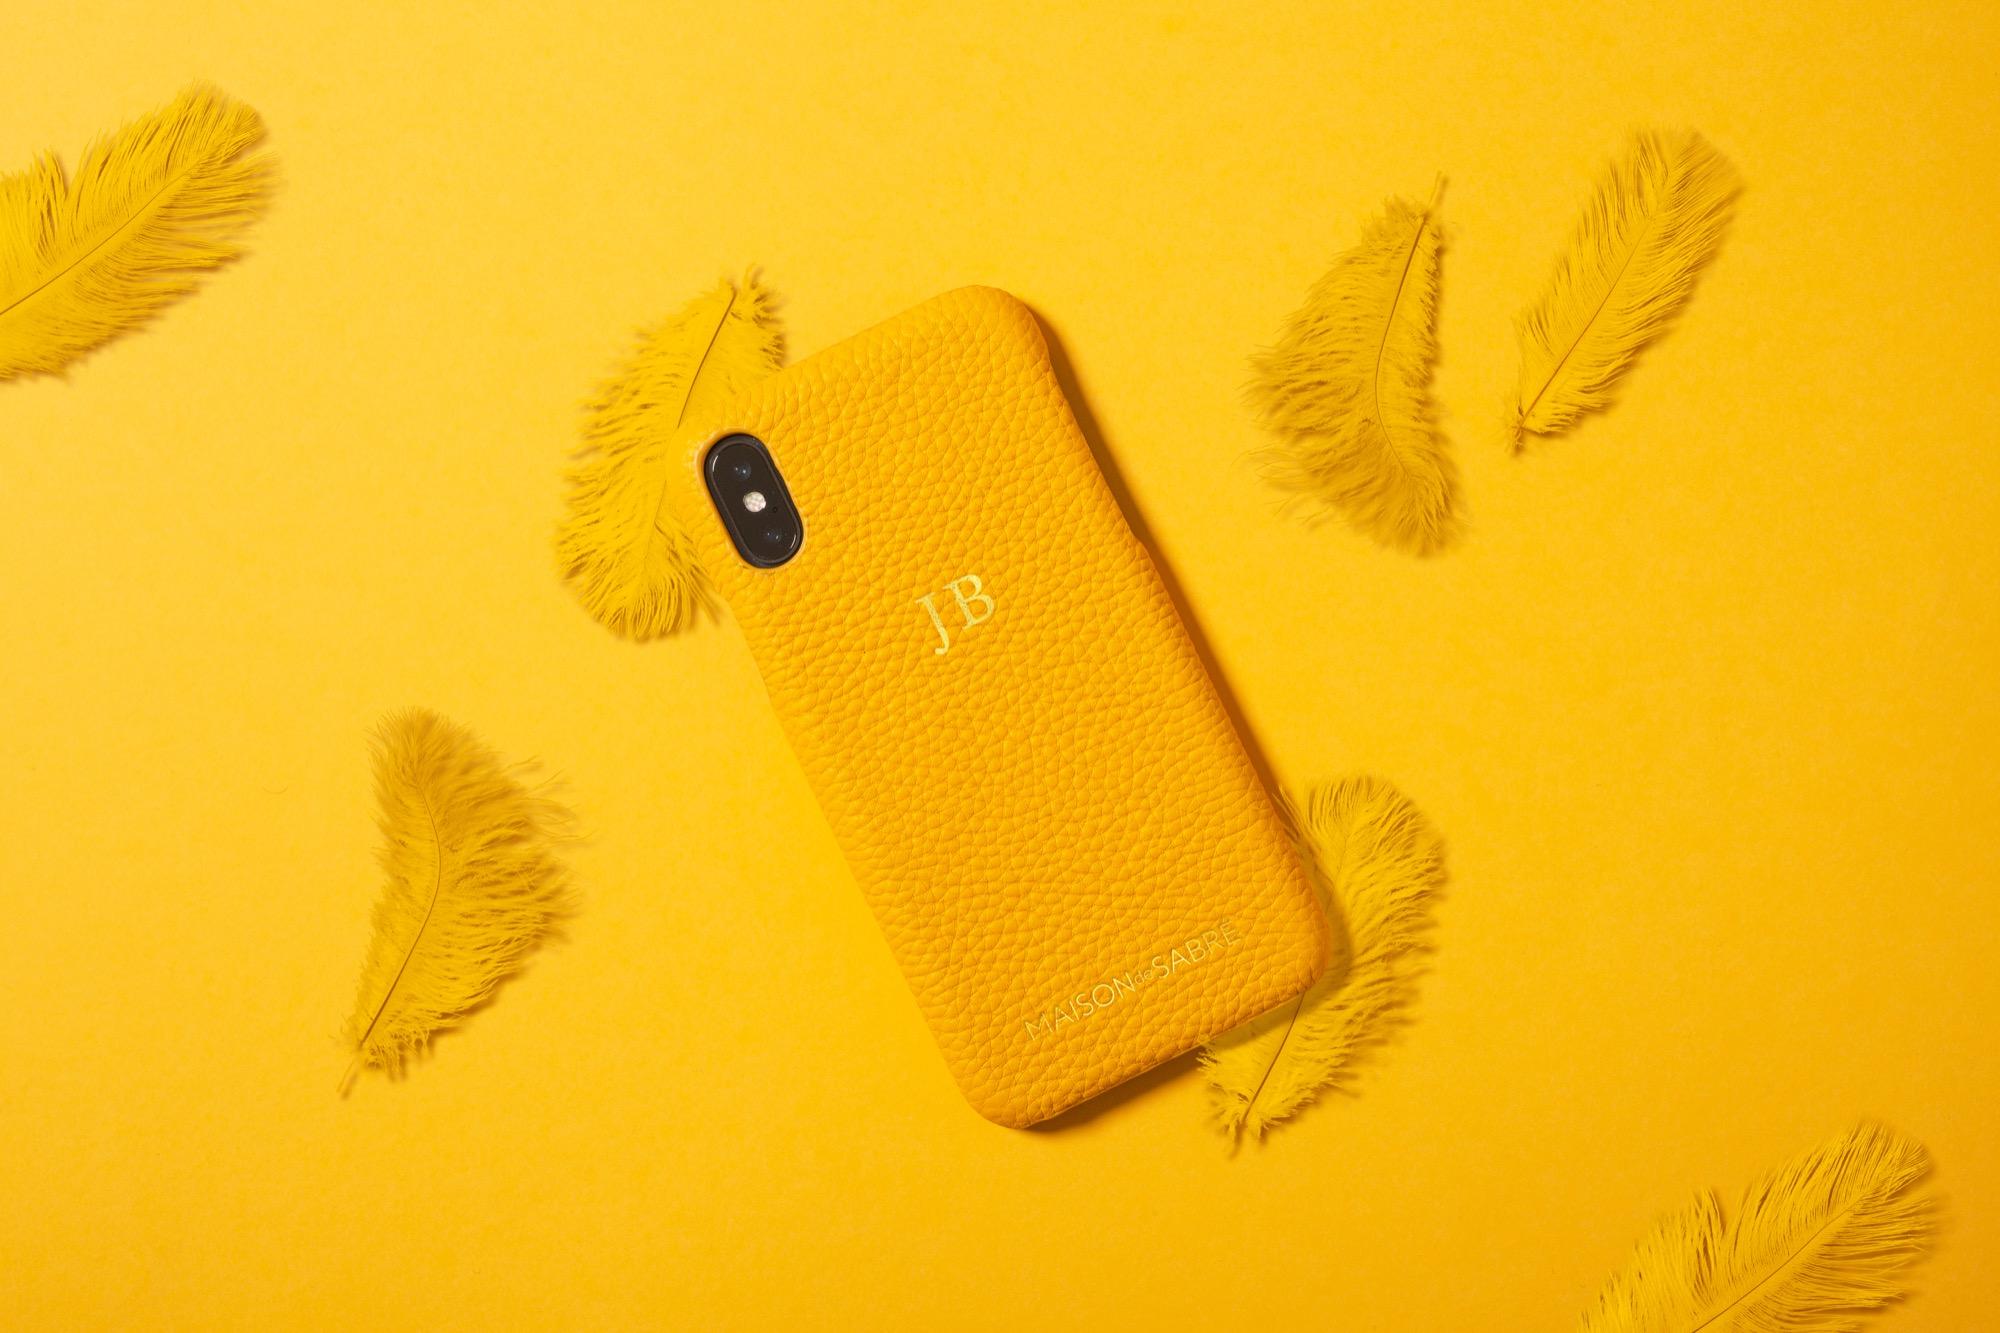 374090767f-Canary-Yellow-iPhone-X(3)-(1).jpg